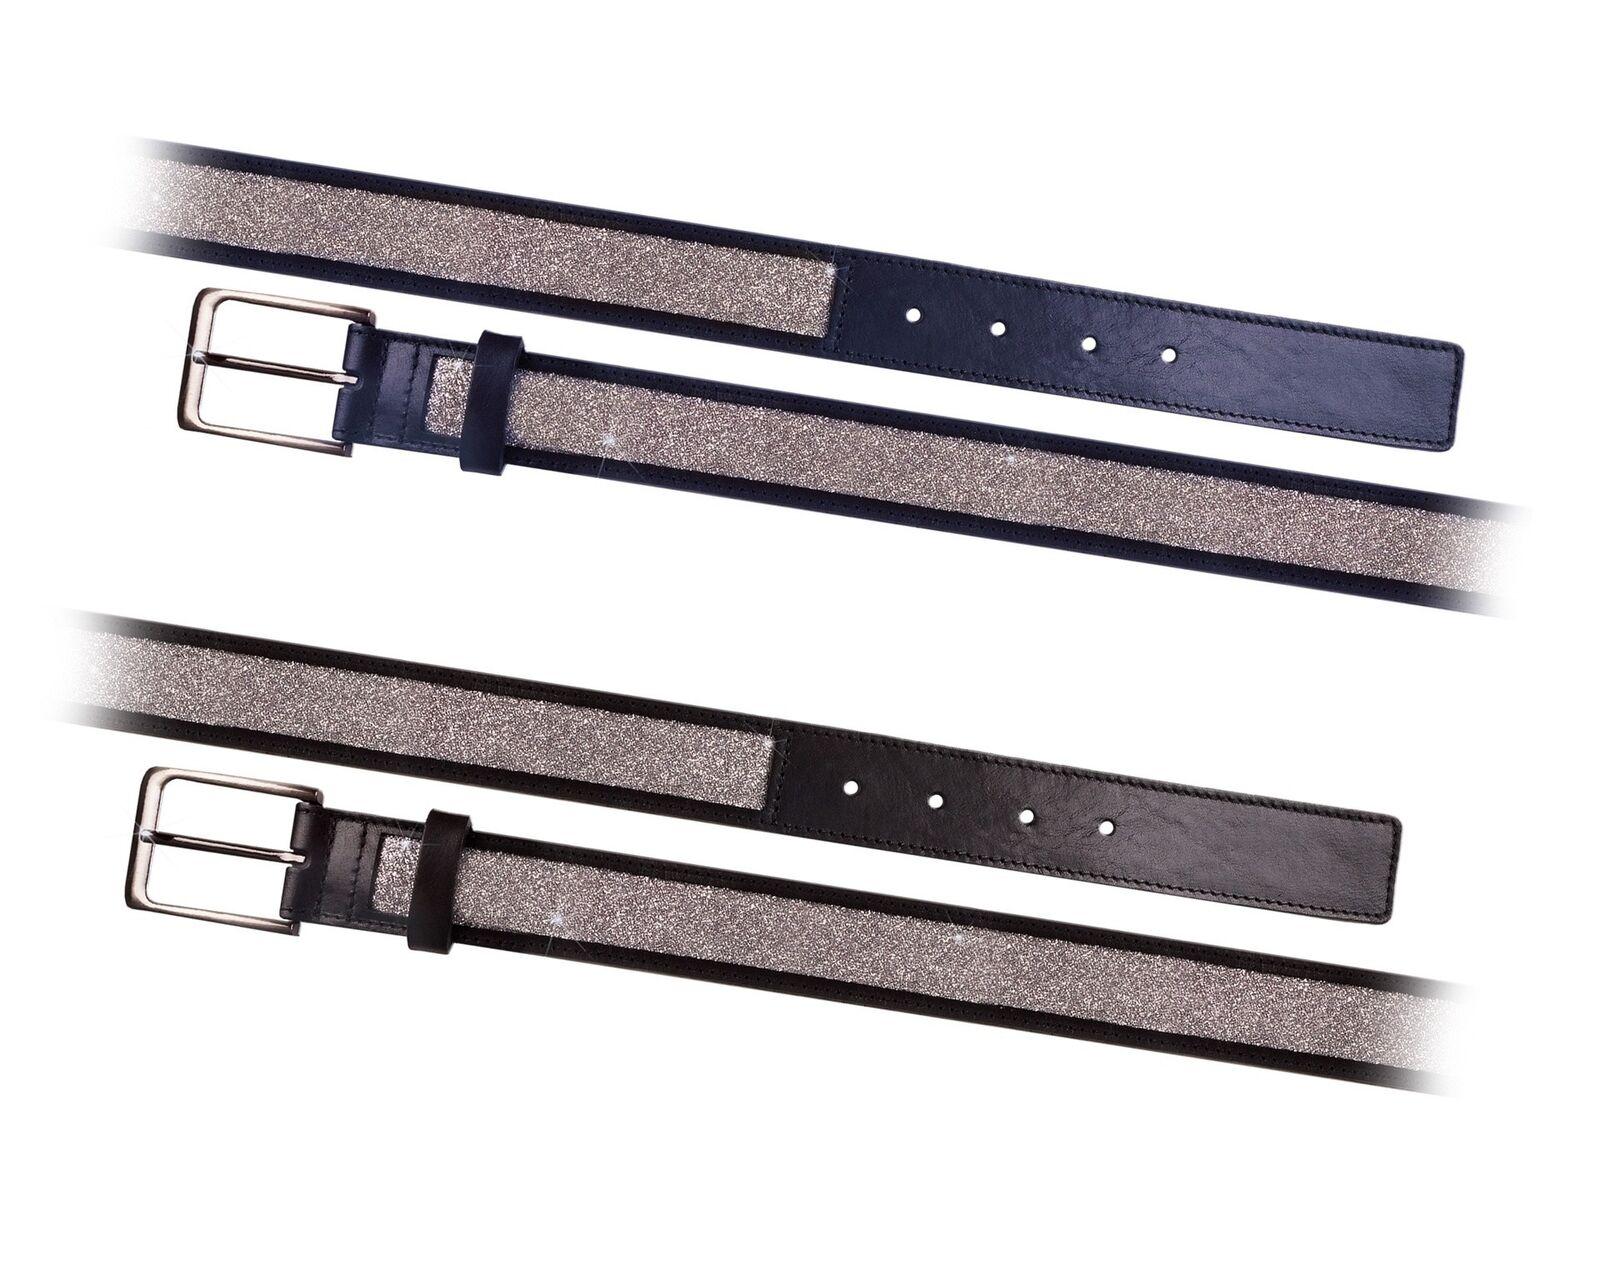 Fair Play glitter leather belt splendor Brown with high-quality,